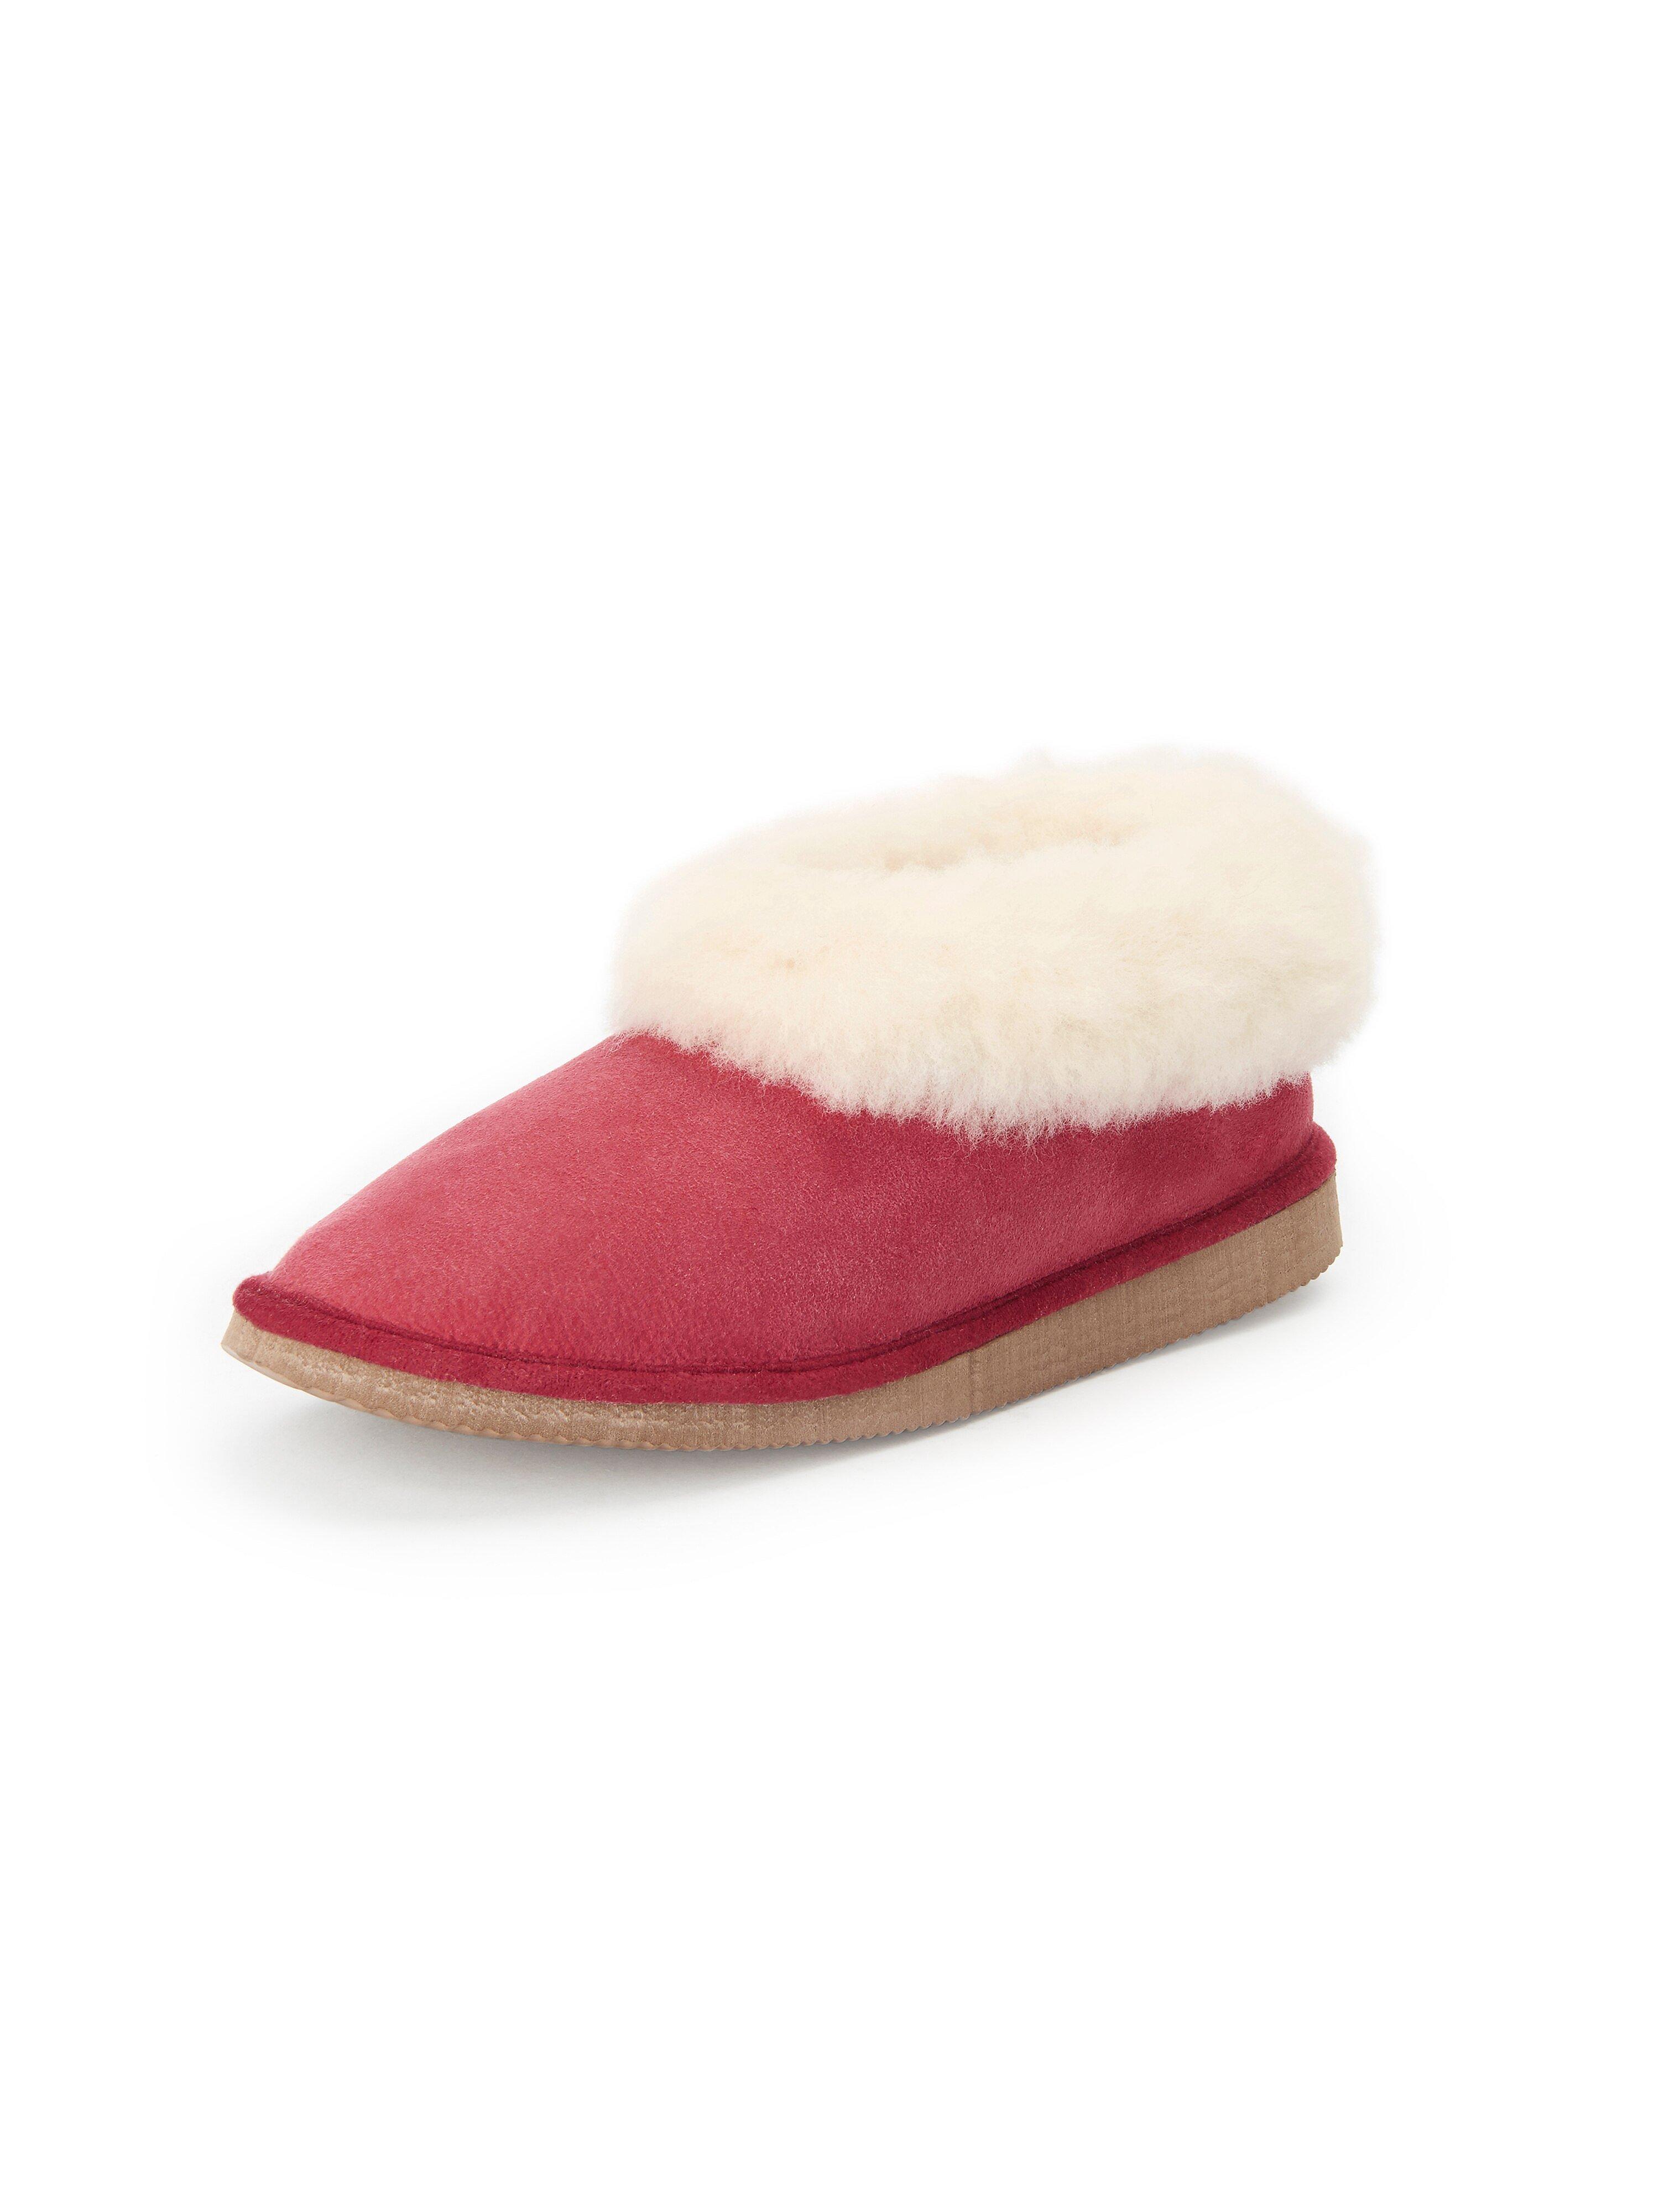 Pantoffels Van Kitzpichler rood